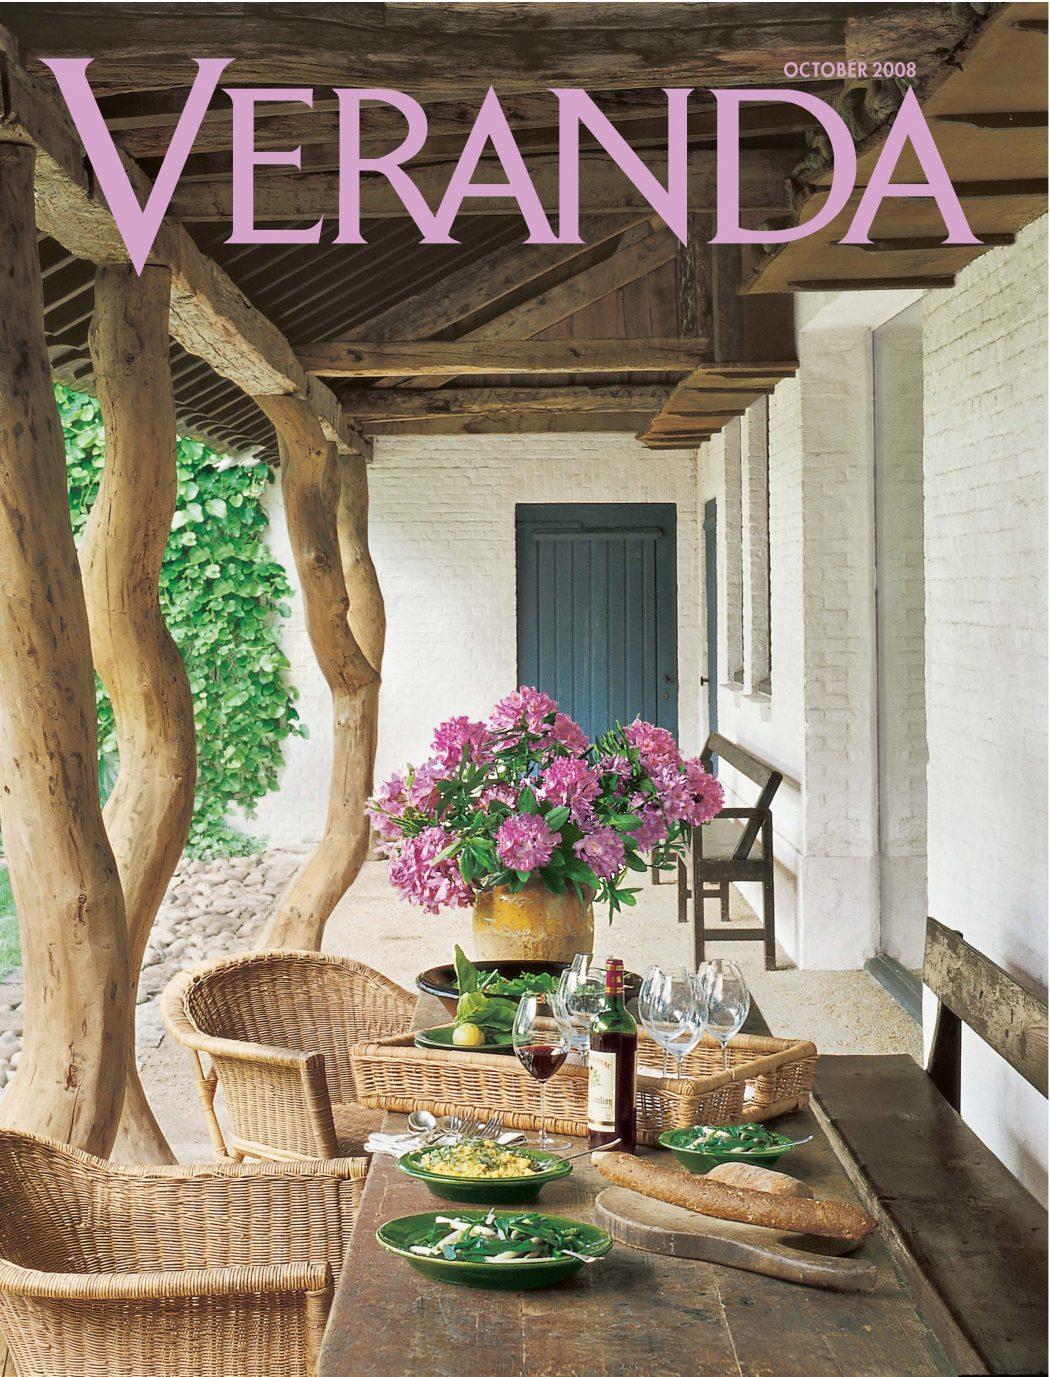 veranda1 Most Popular Home Decor Magazines